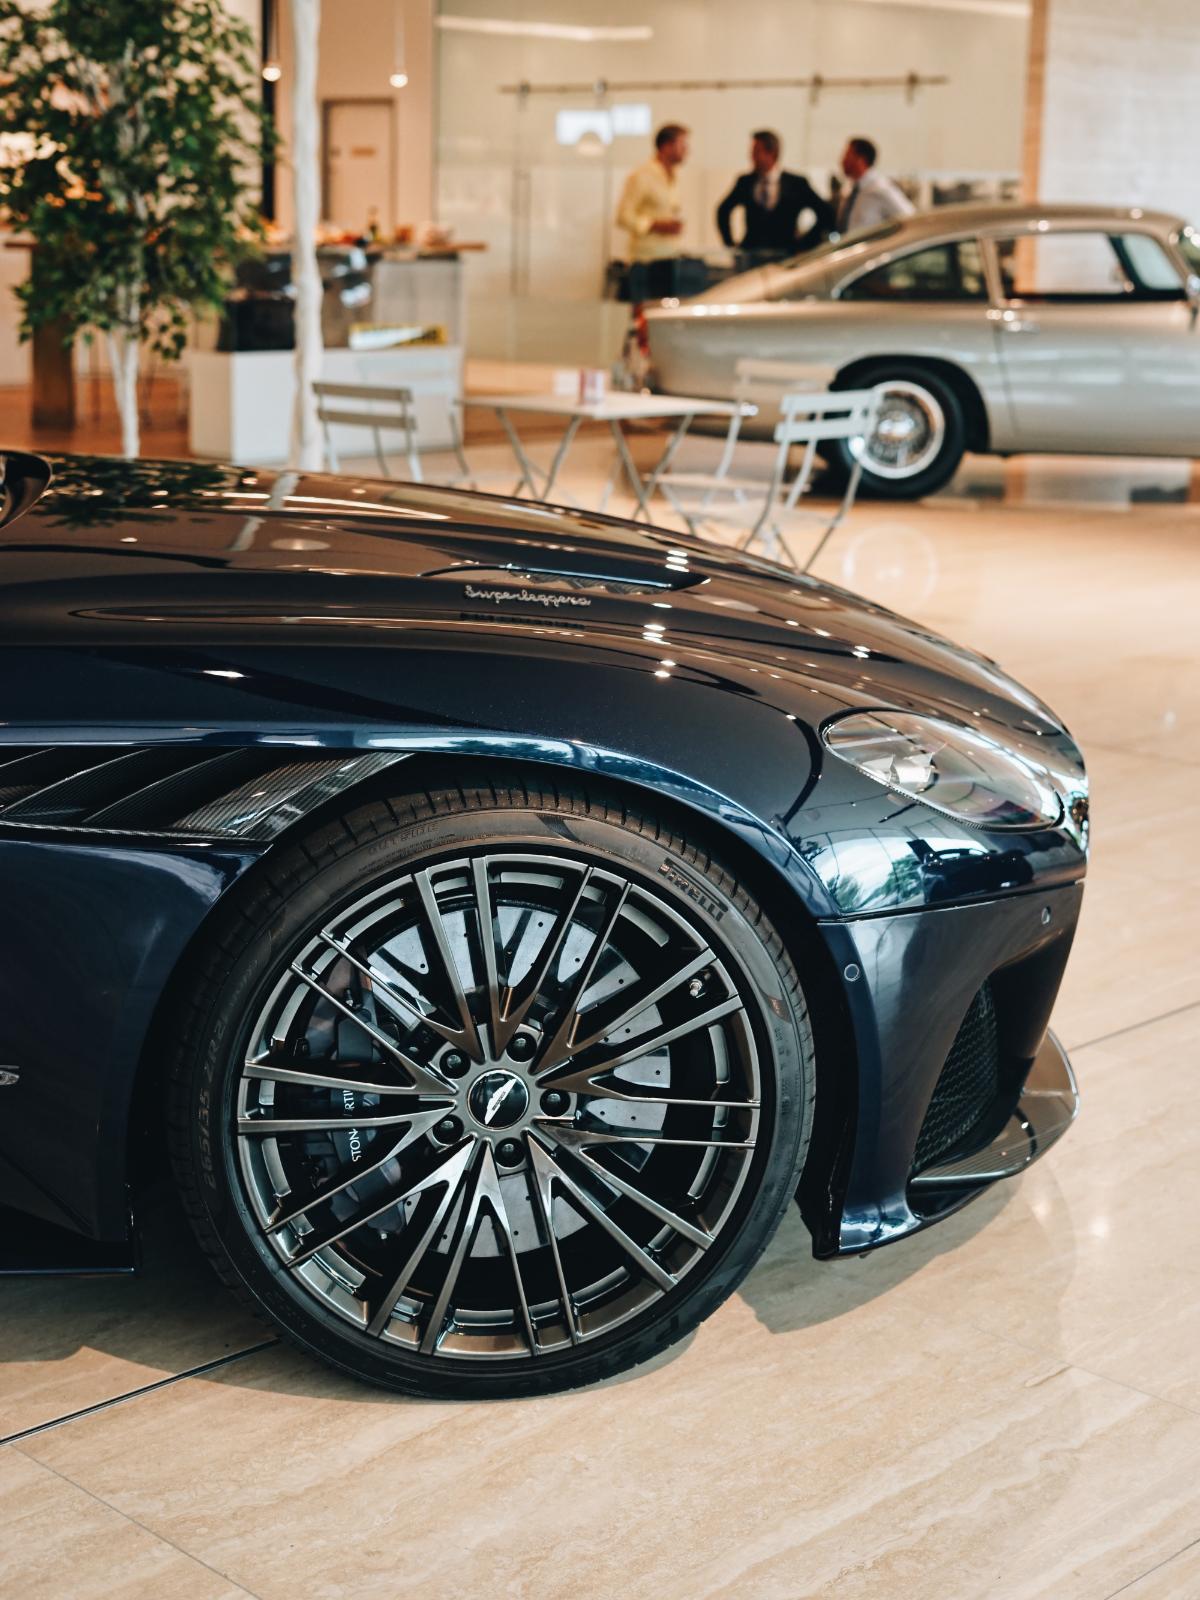 Aston Martin DBS Superleggera Volante Portrait Wheel